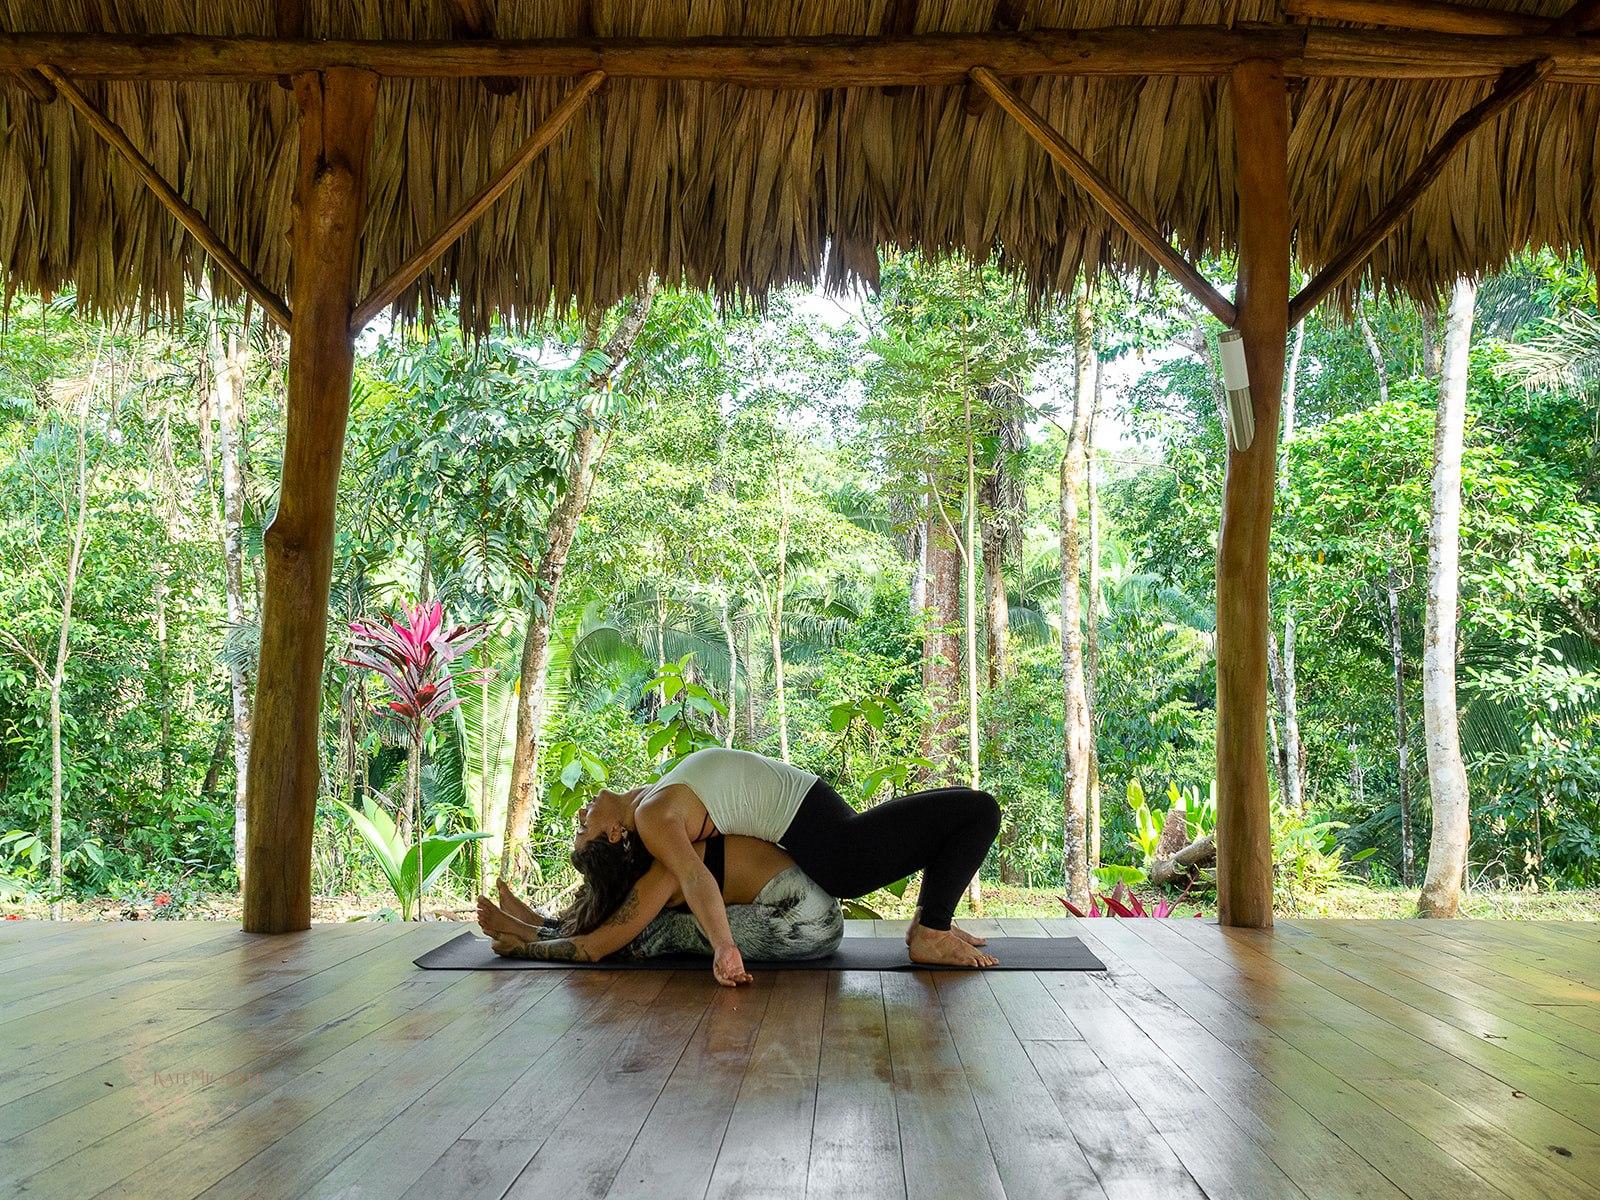 kylie-roswell-yoga-teacher-training-durga-excursions.jpg